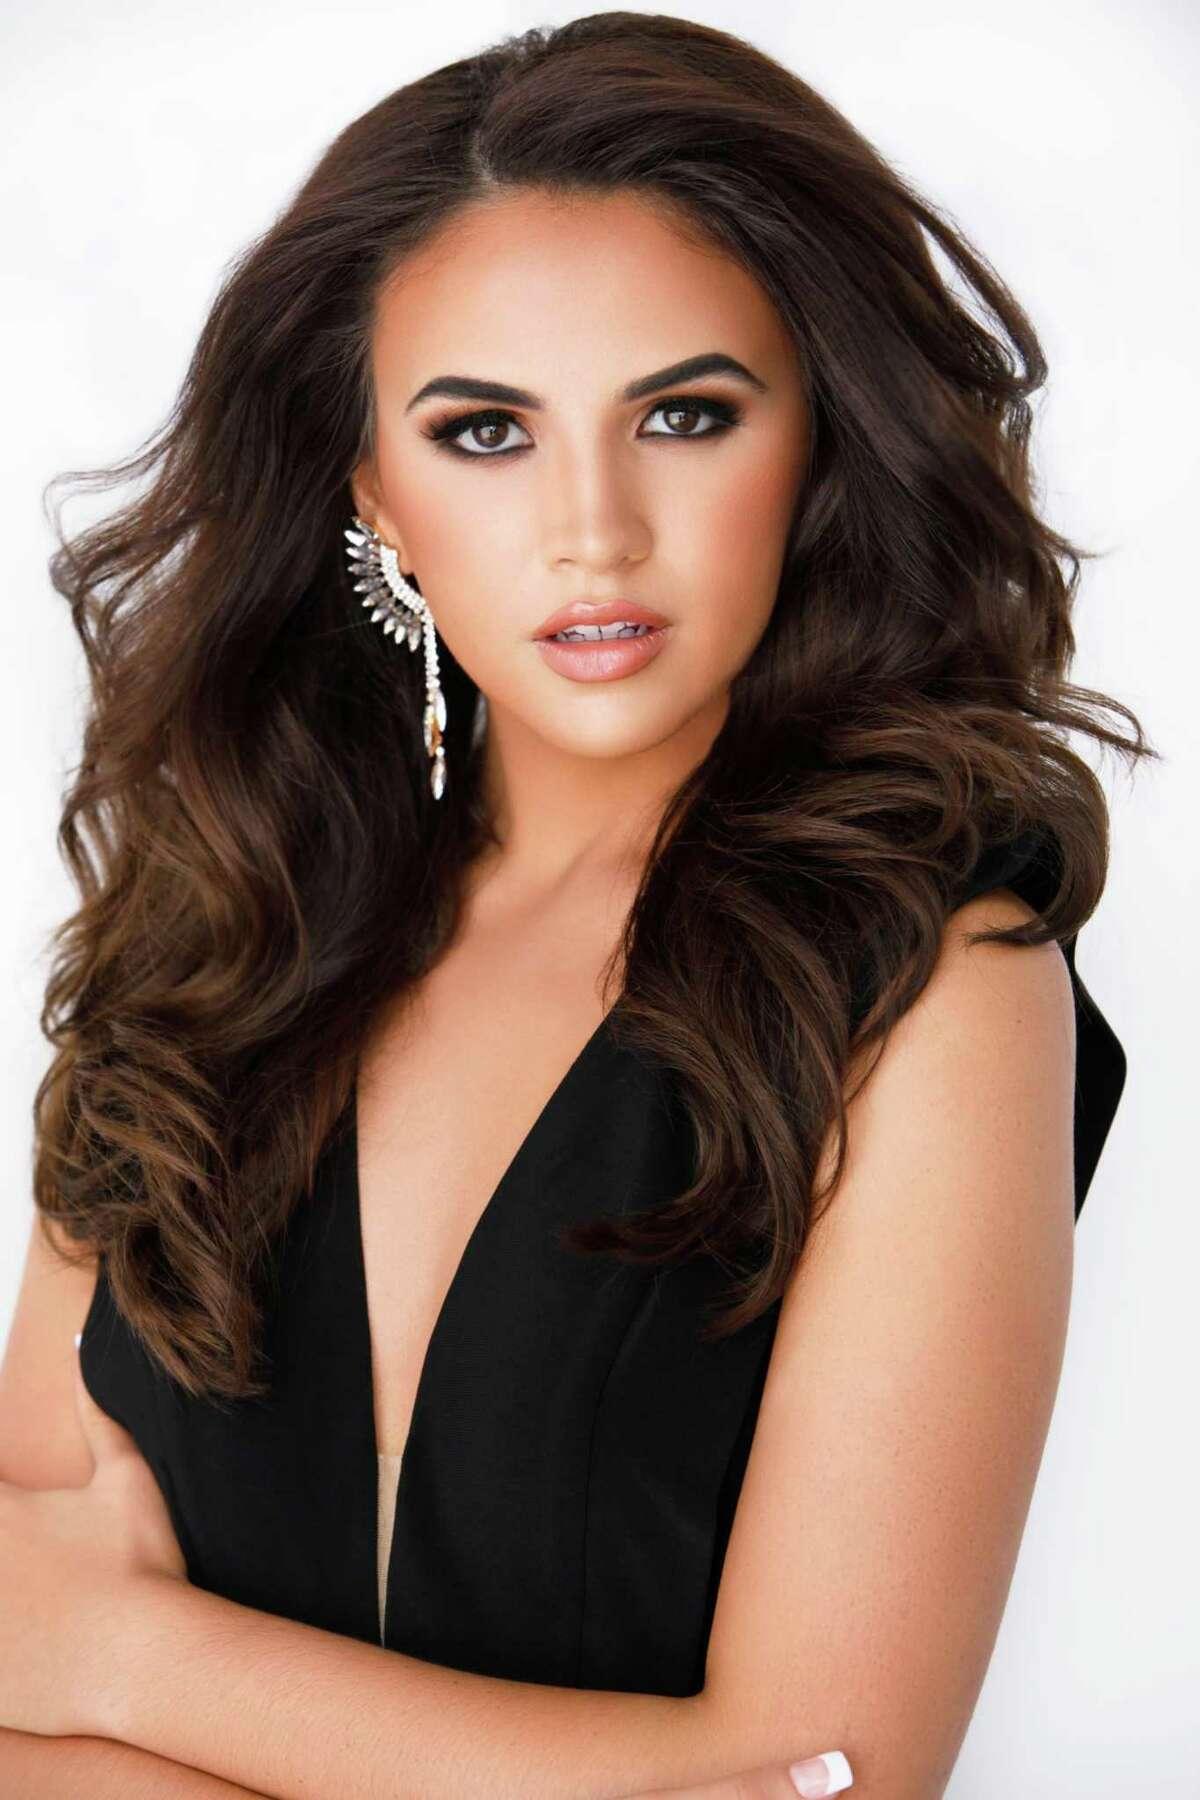 Miss Southwest Texas USA Celissa Pena